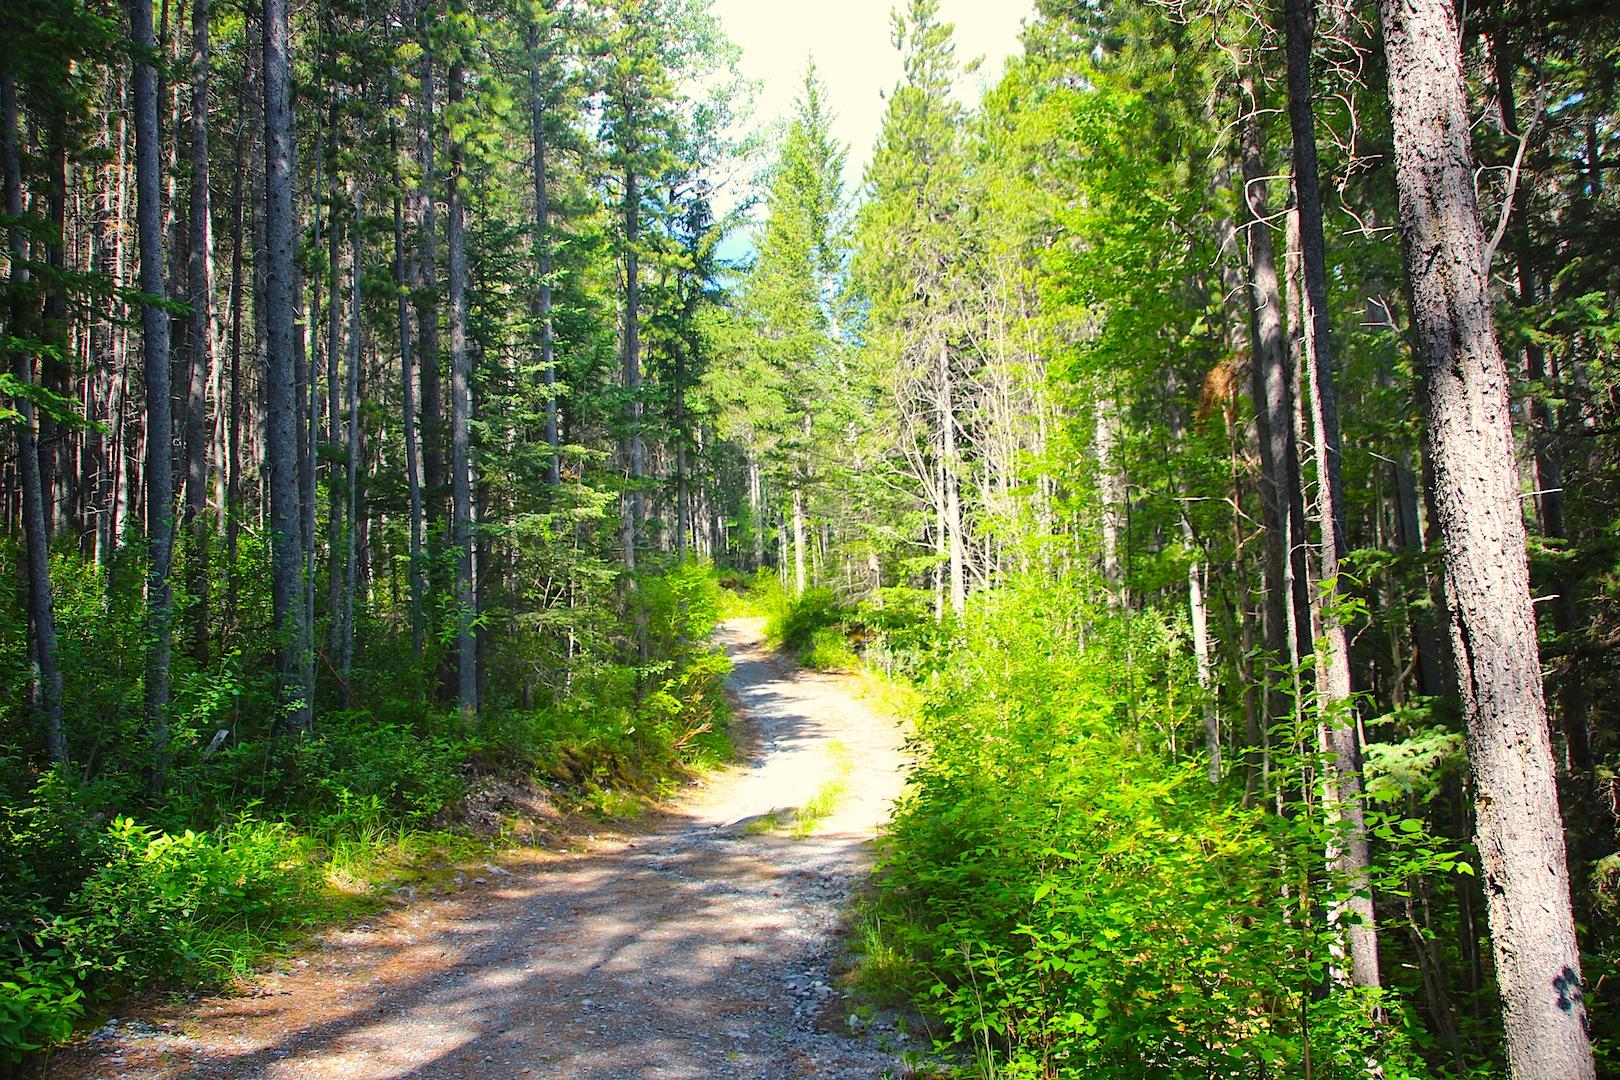 002 - Trail